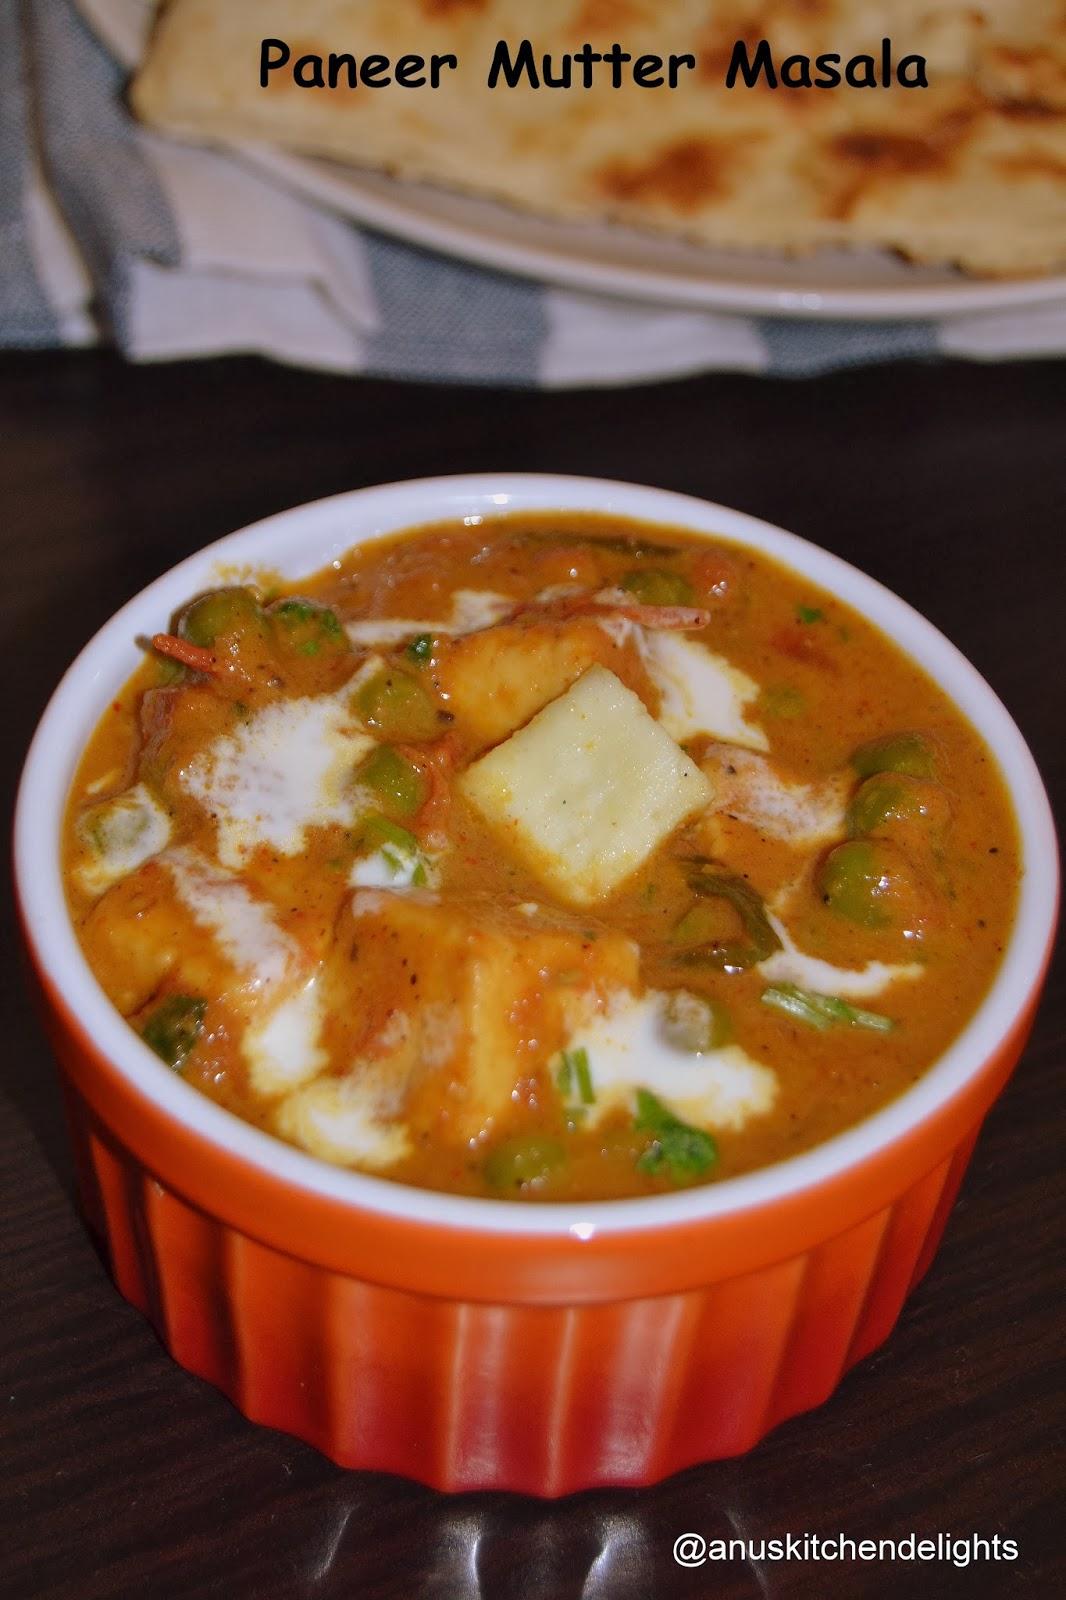 Paneer and peas masala